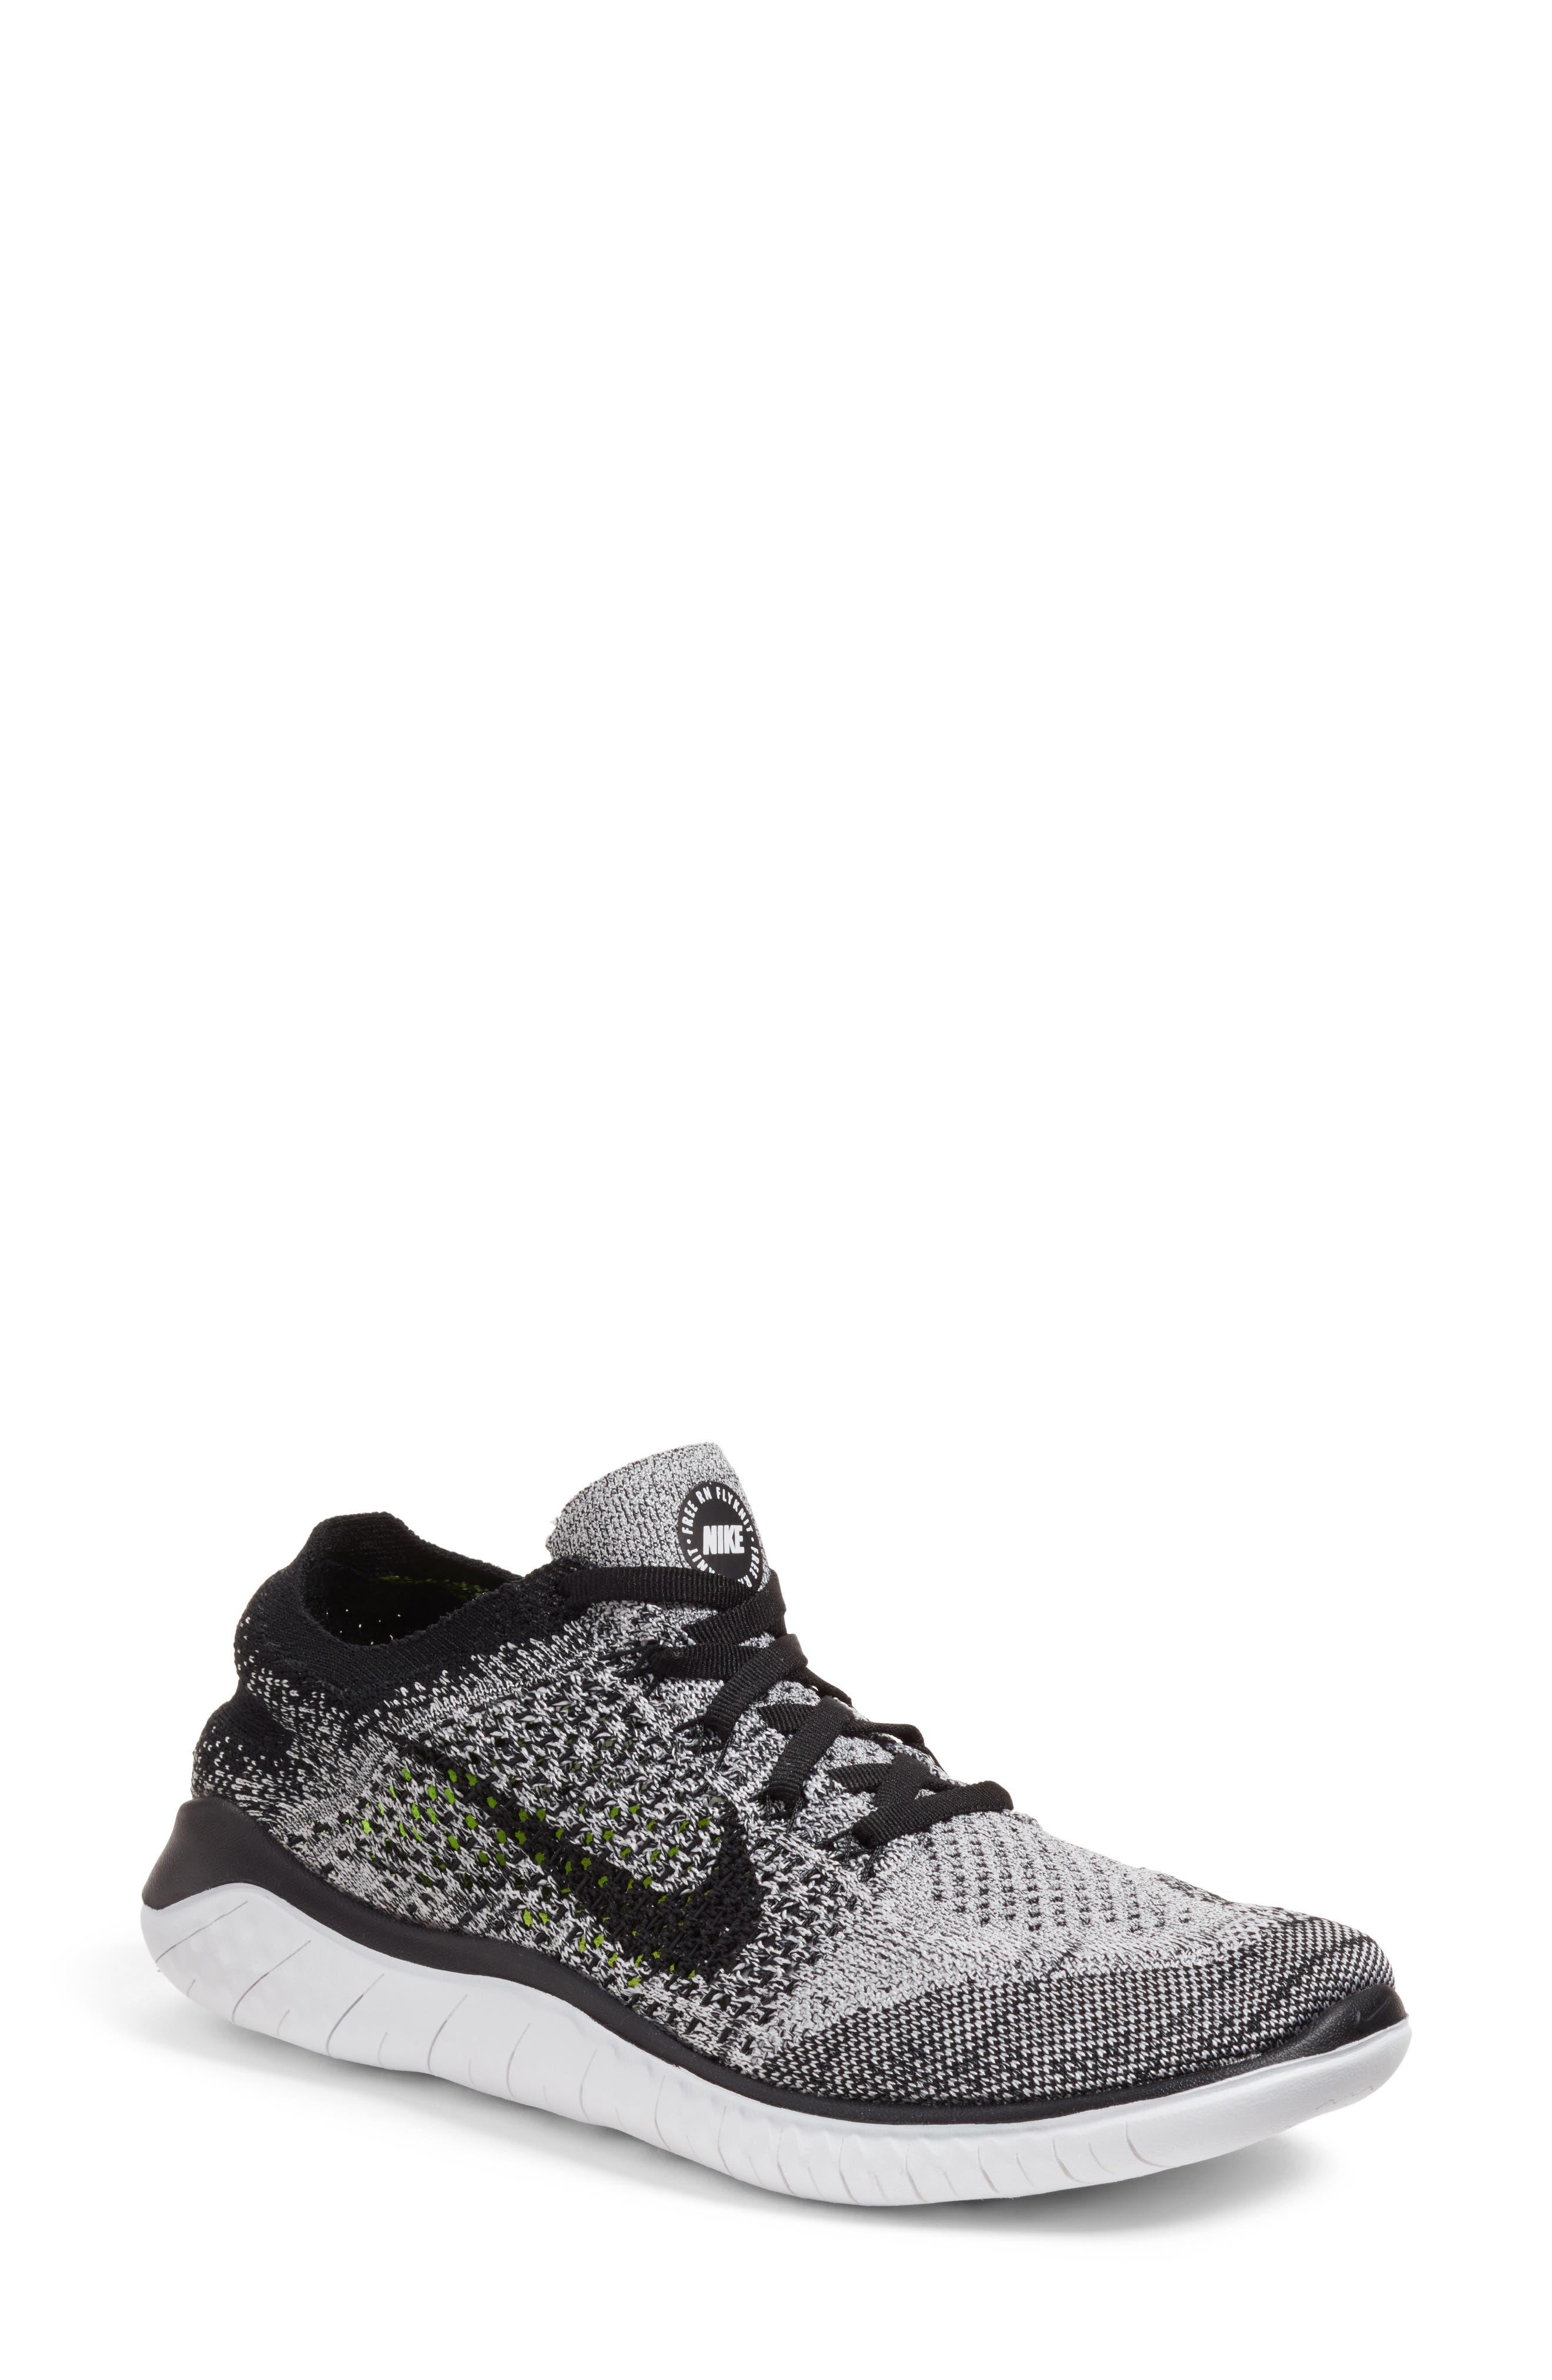 e073ecc20bd Nike Kd 6 Home 11 Nike Air Jordan Slides